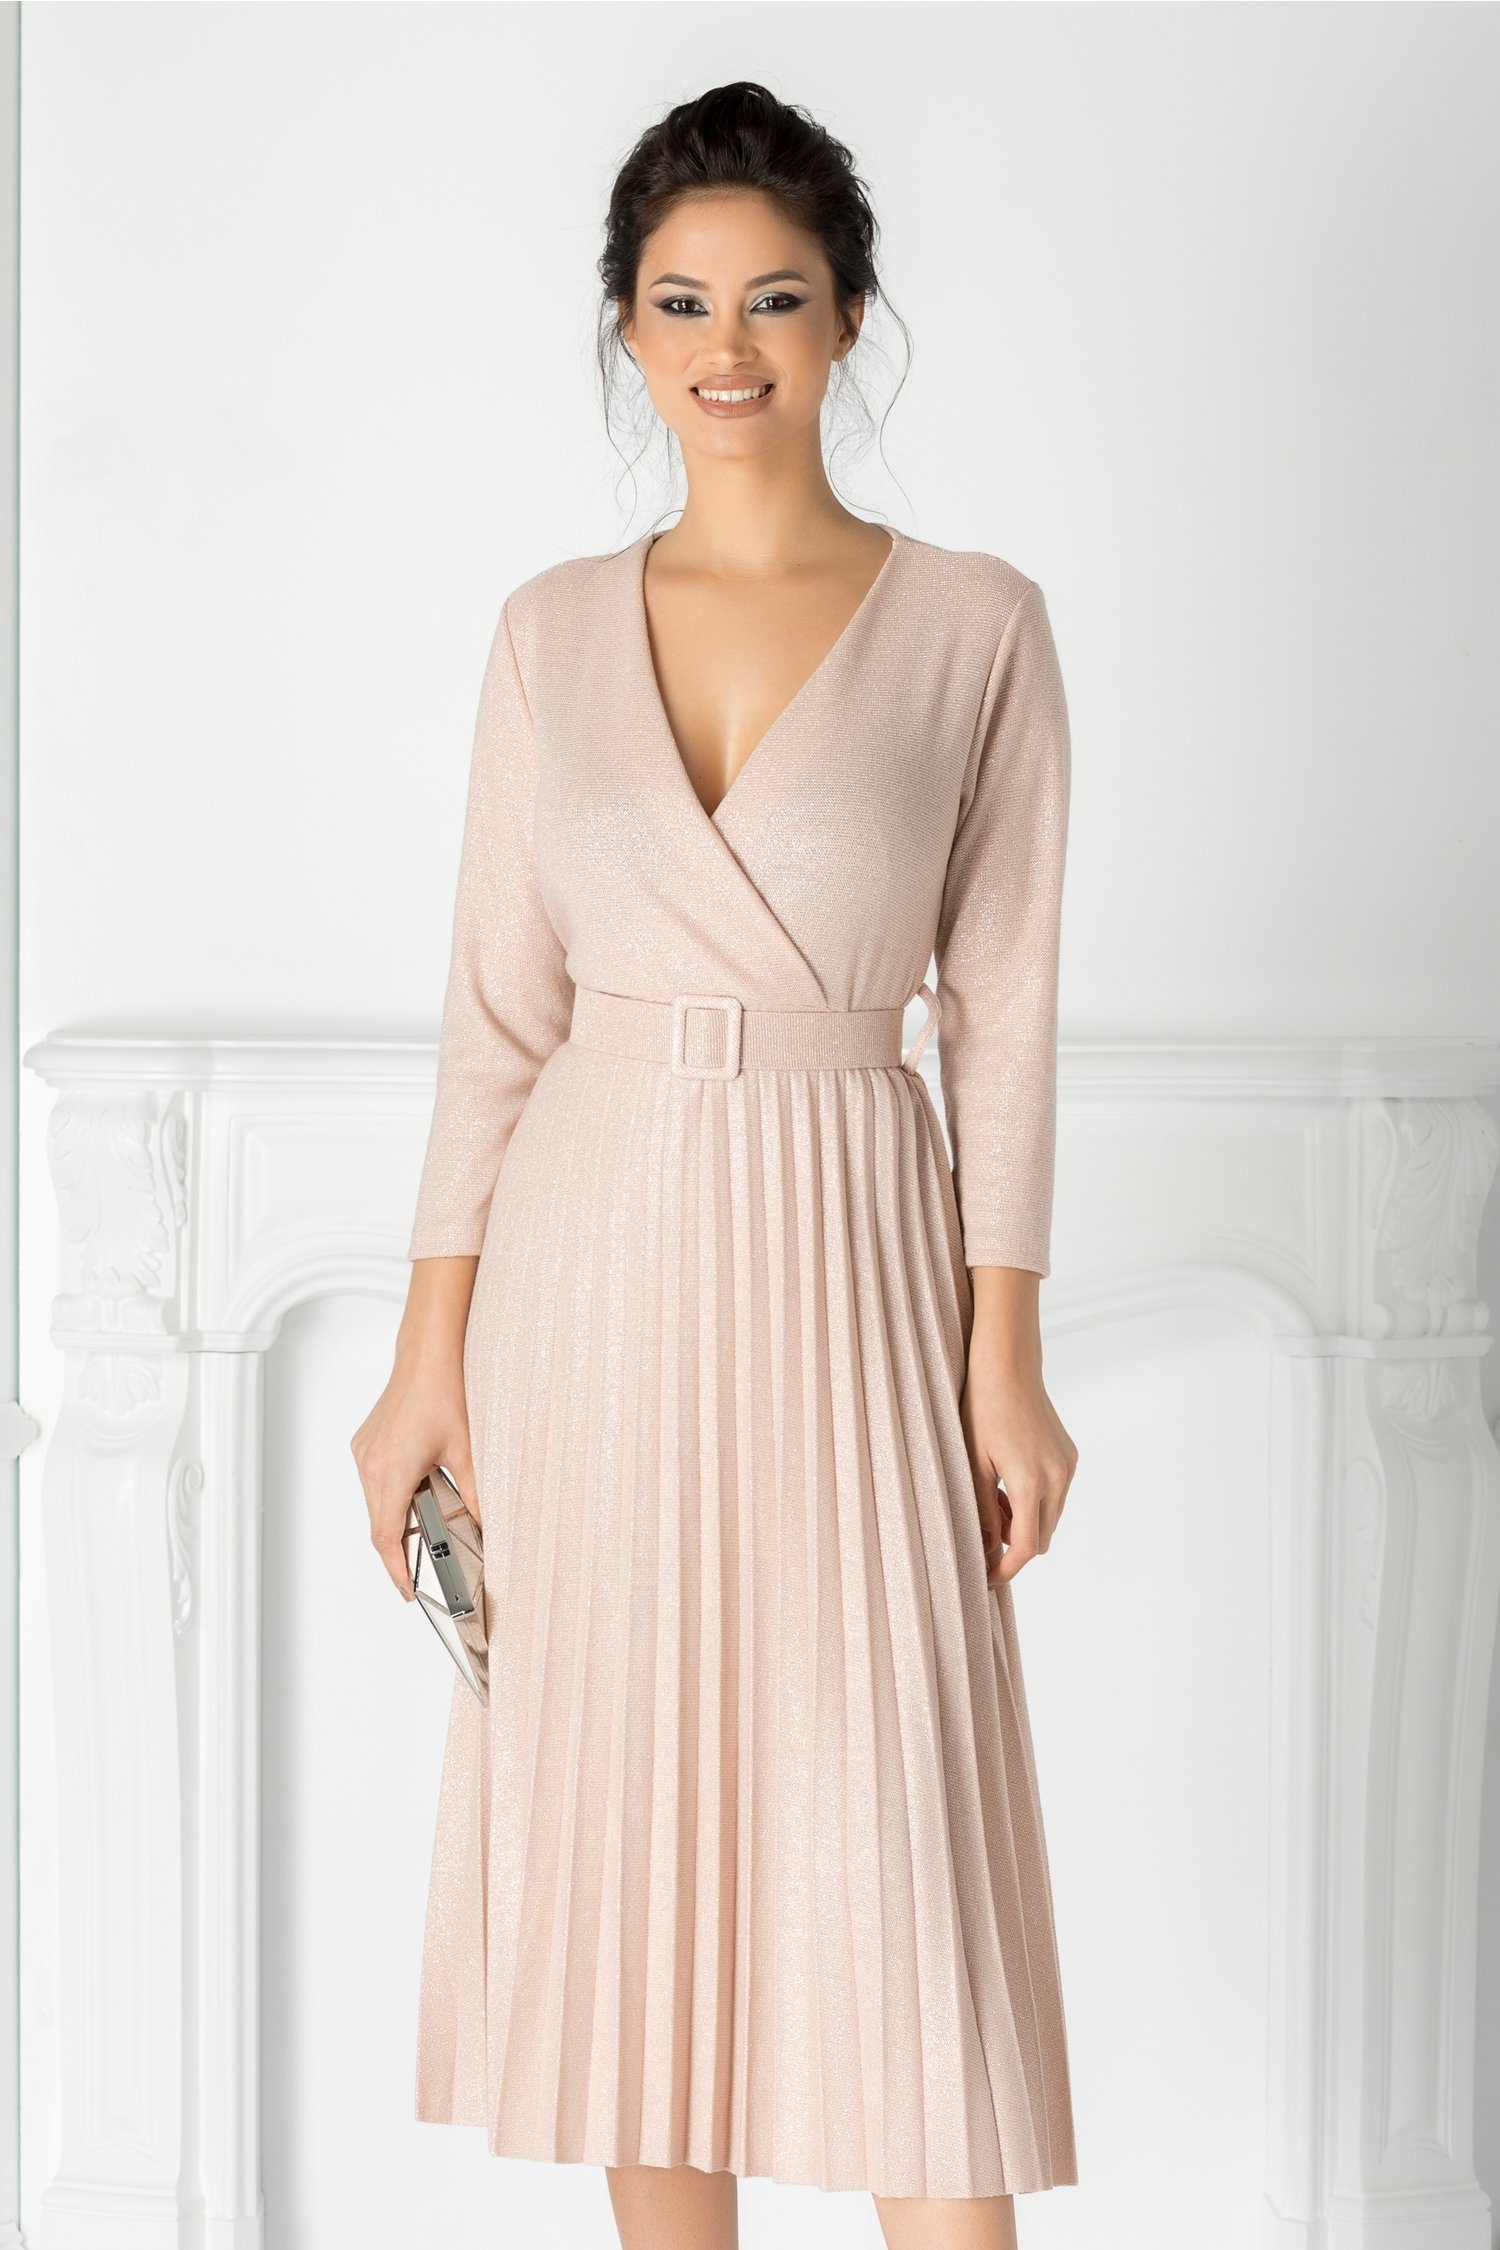 Rochie Carla roz plisata cu decolteu petrecut